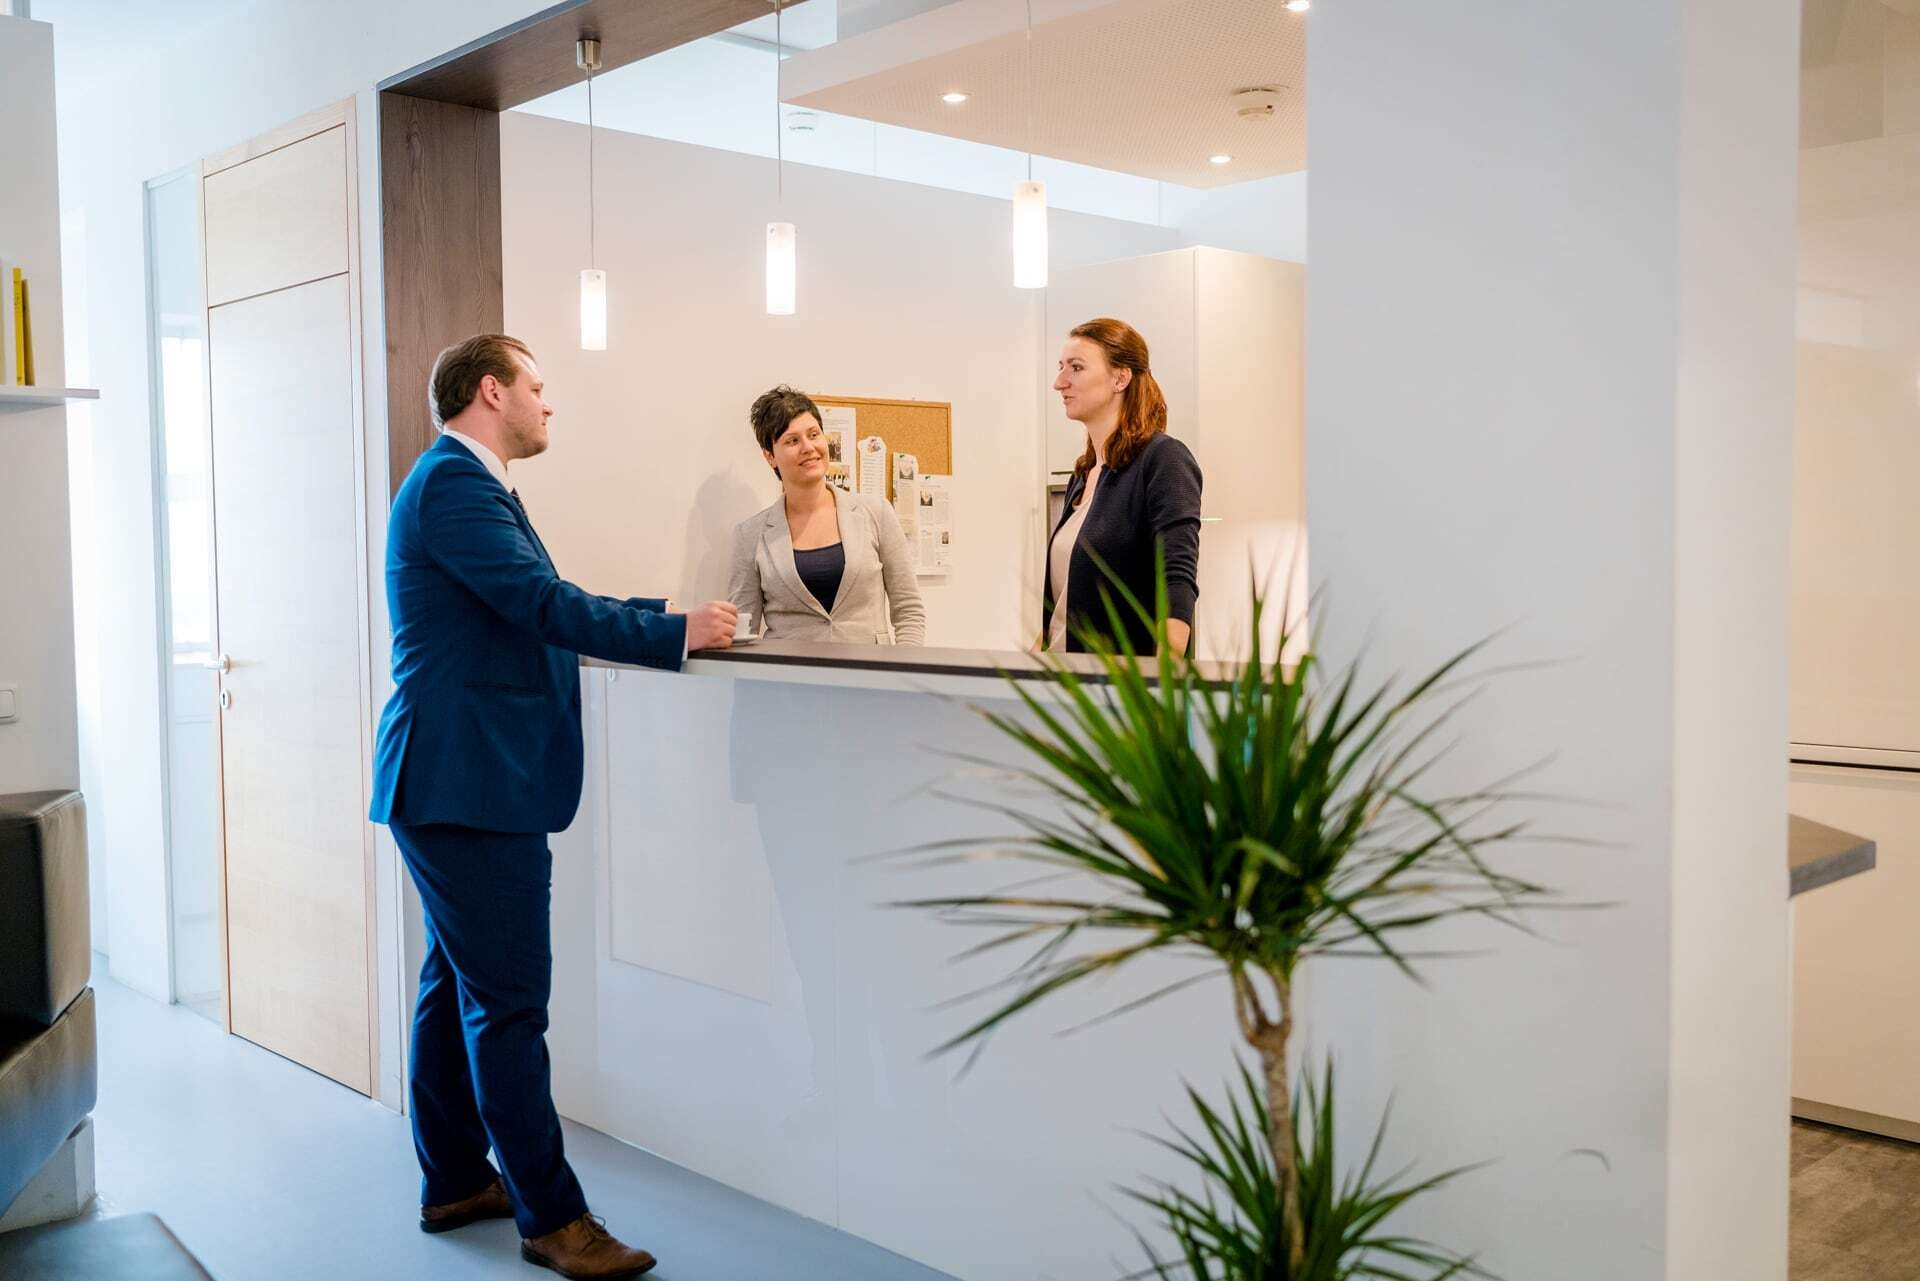 Uniconsult Steuerberatung in Linz, Peuerbach, Ried im Innkreis